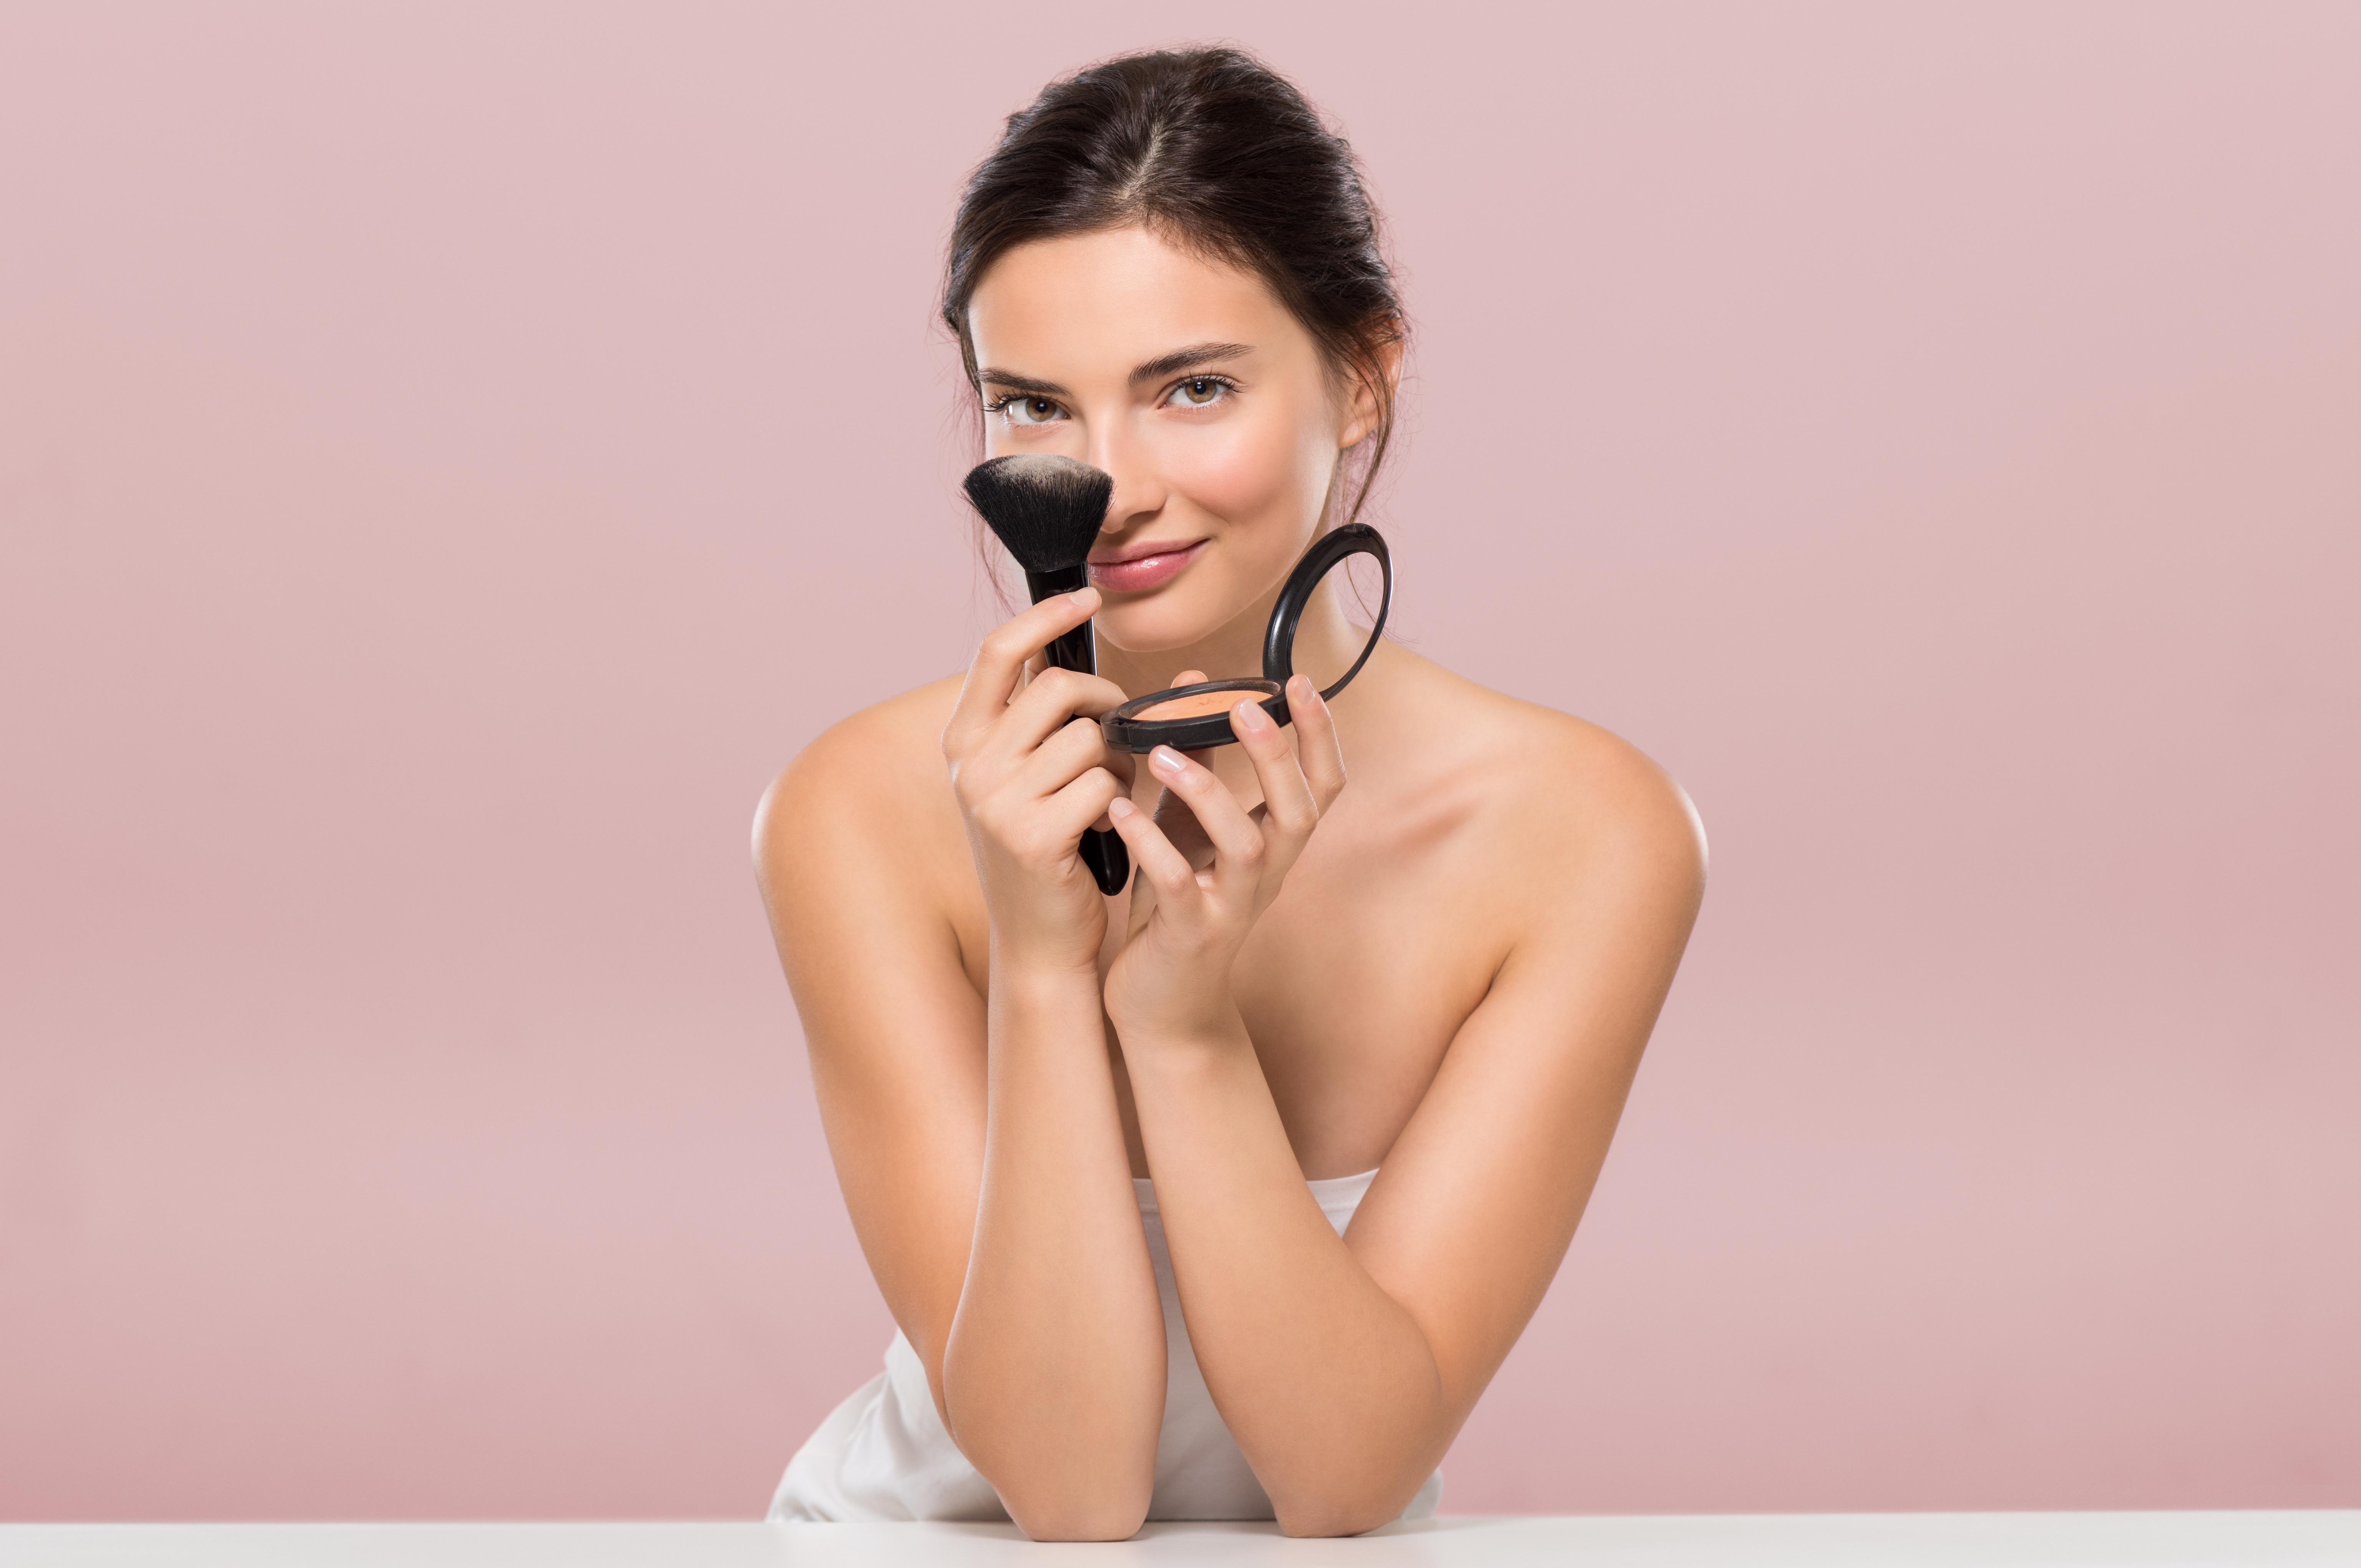 Spune-mi ce tip de ten ai ca sa-ti spun cum sa-l pregatesti pentru make-up!